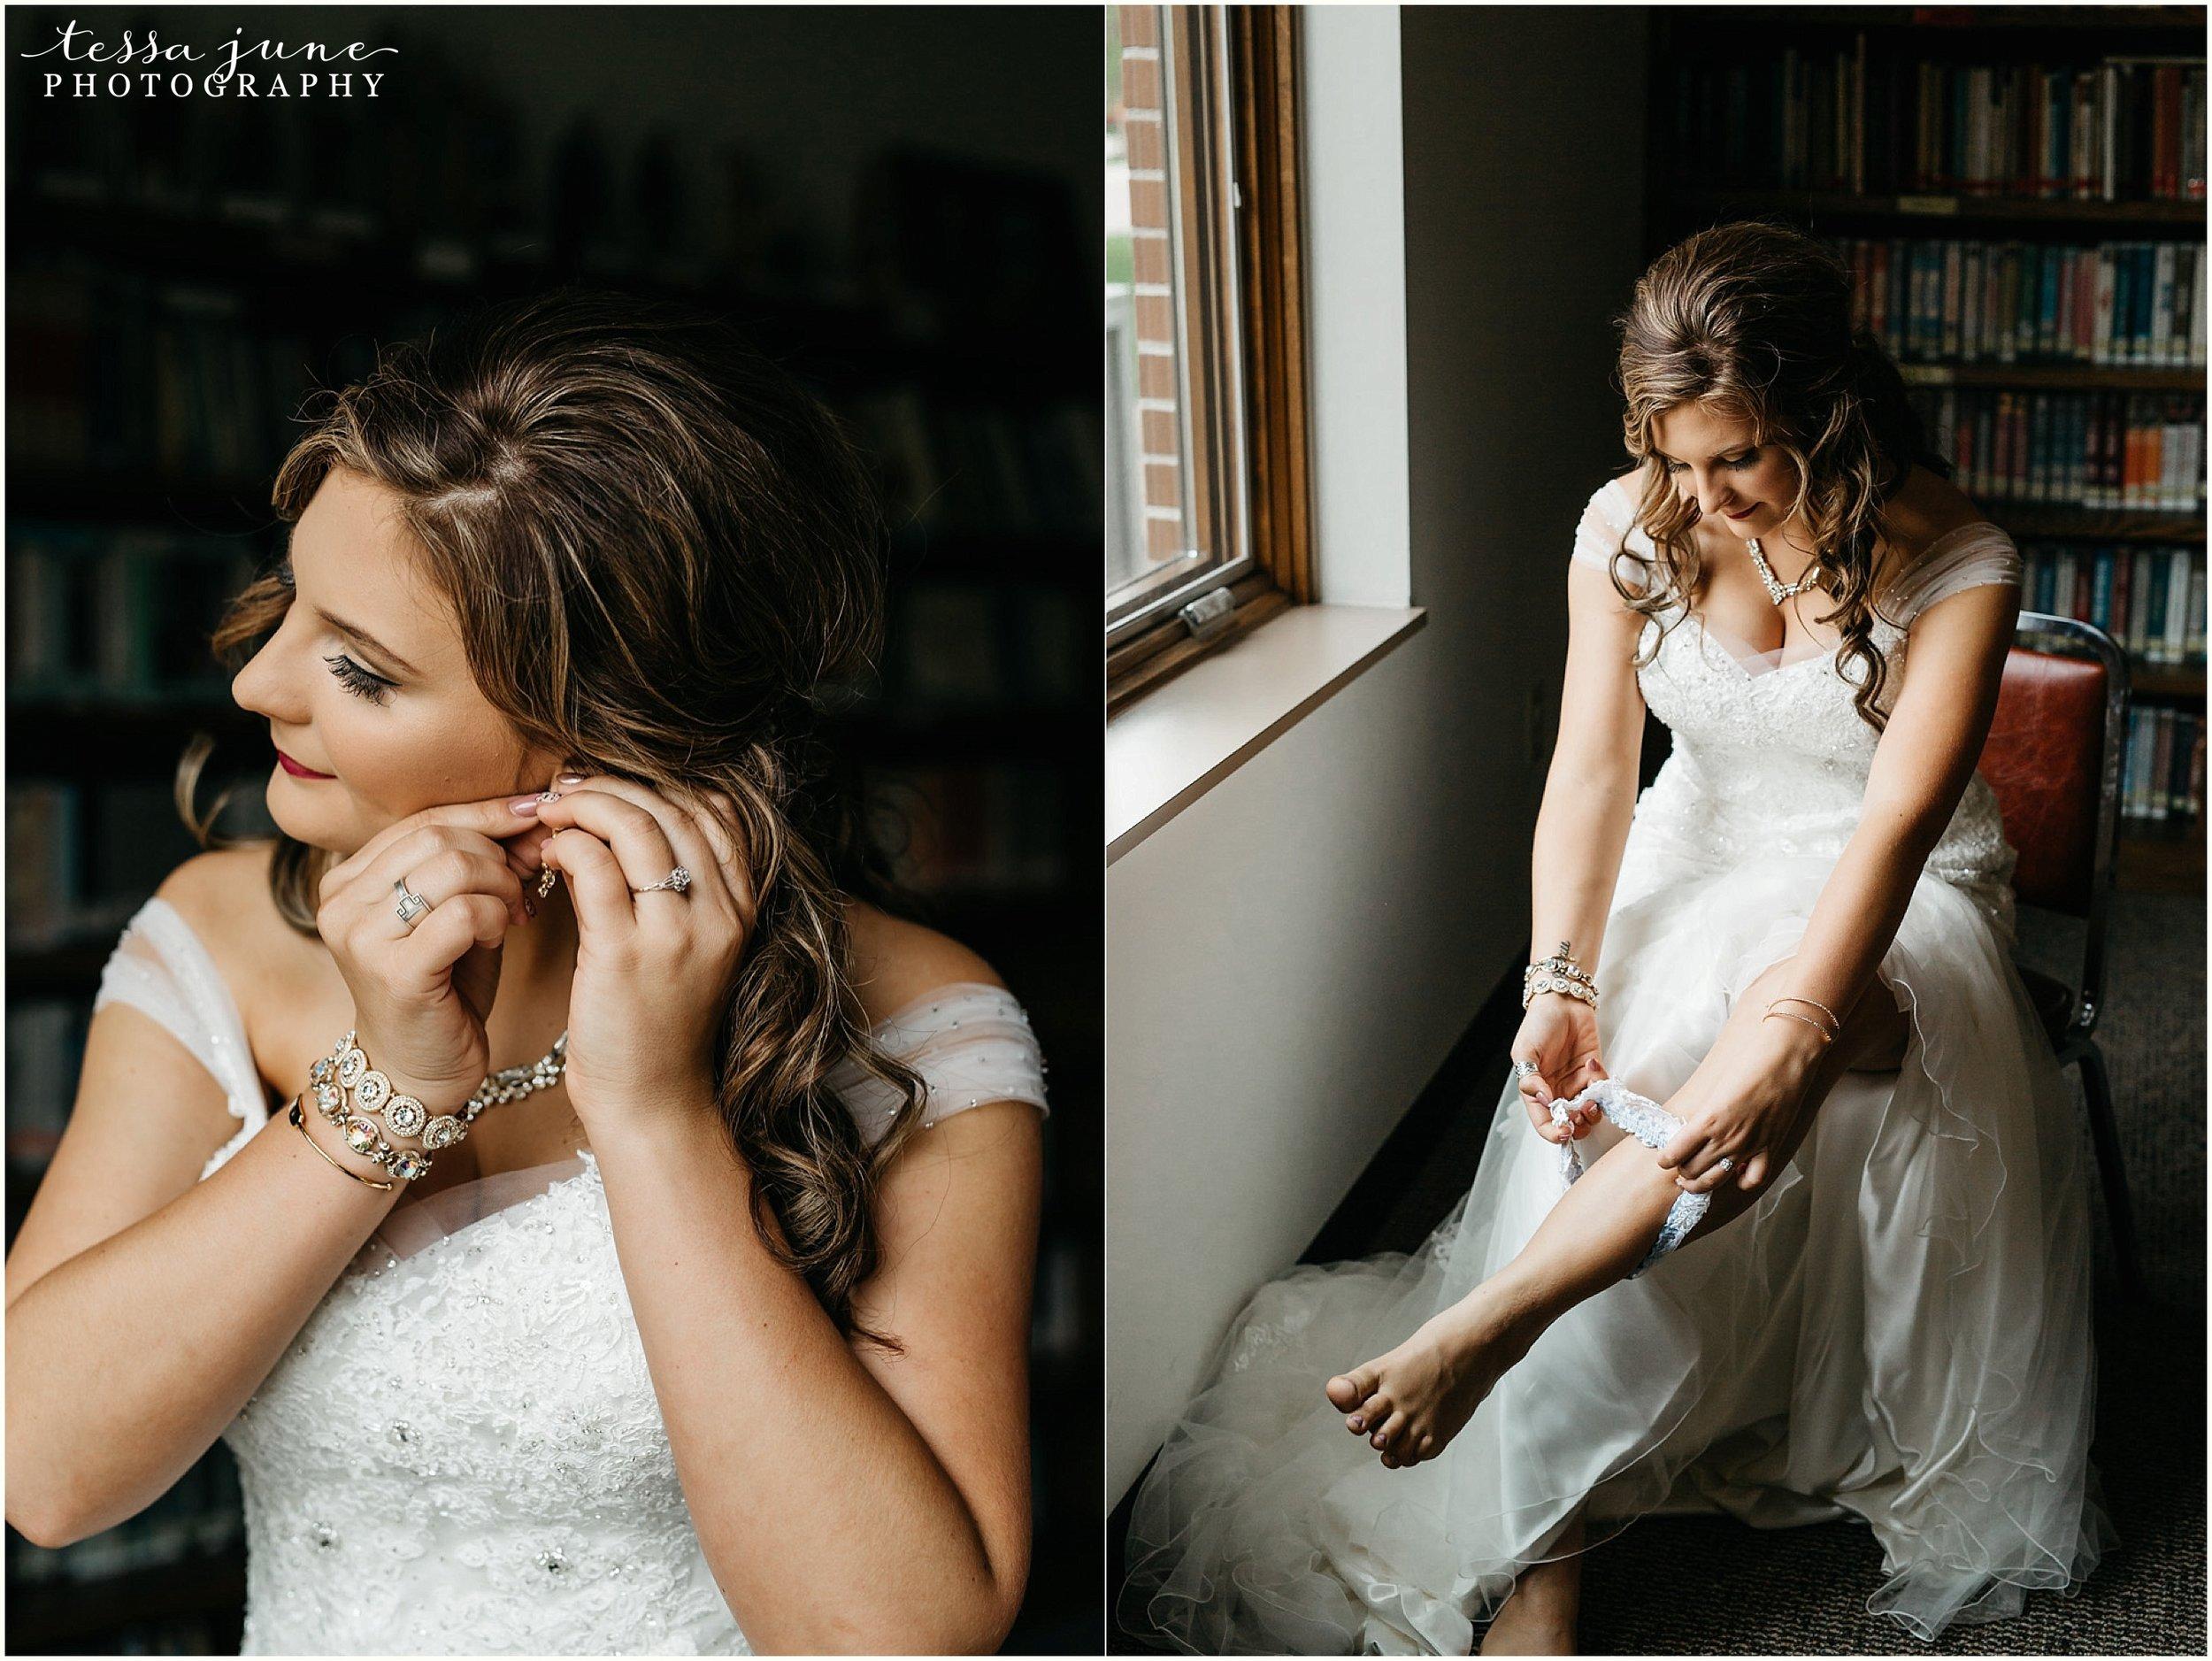 bohemian-minnesota-wedding-mismatched-bridesmaid-dresses-waterfall-st-cloud-tessa-june-photography-29.jpg